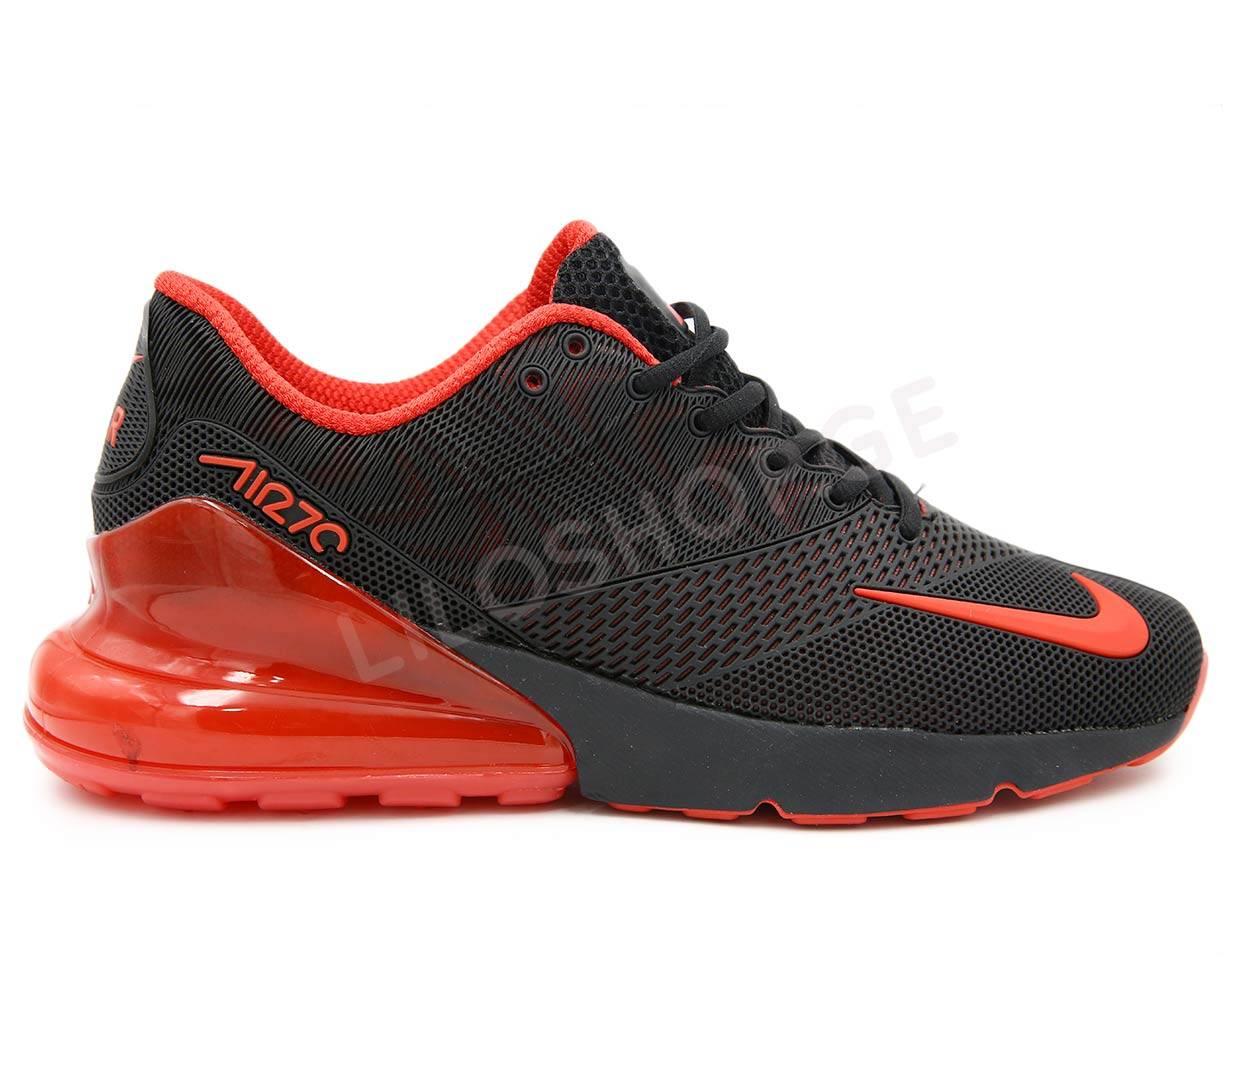 9d41fc7e Shoes :: Boy :: Botany Nike Air 270 - ინტერნეტ ...